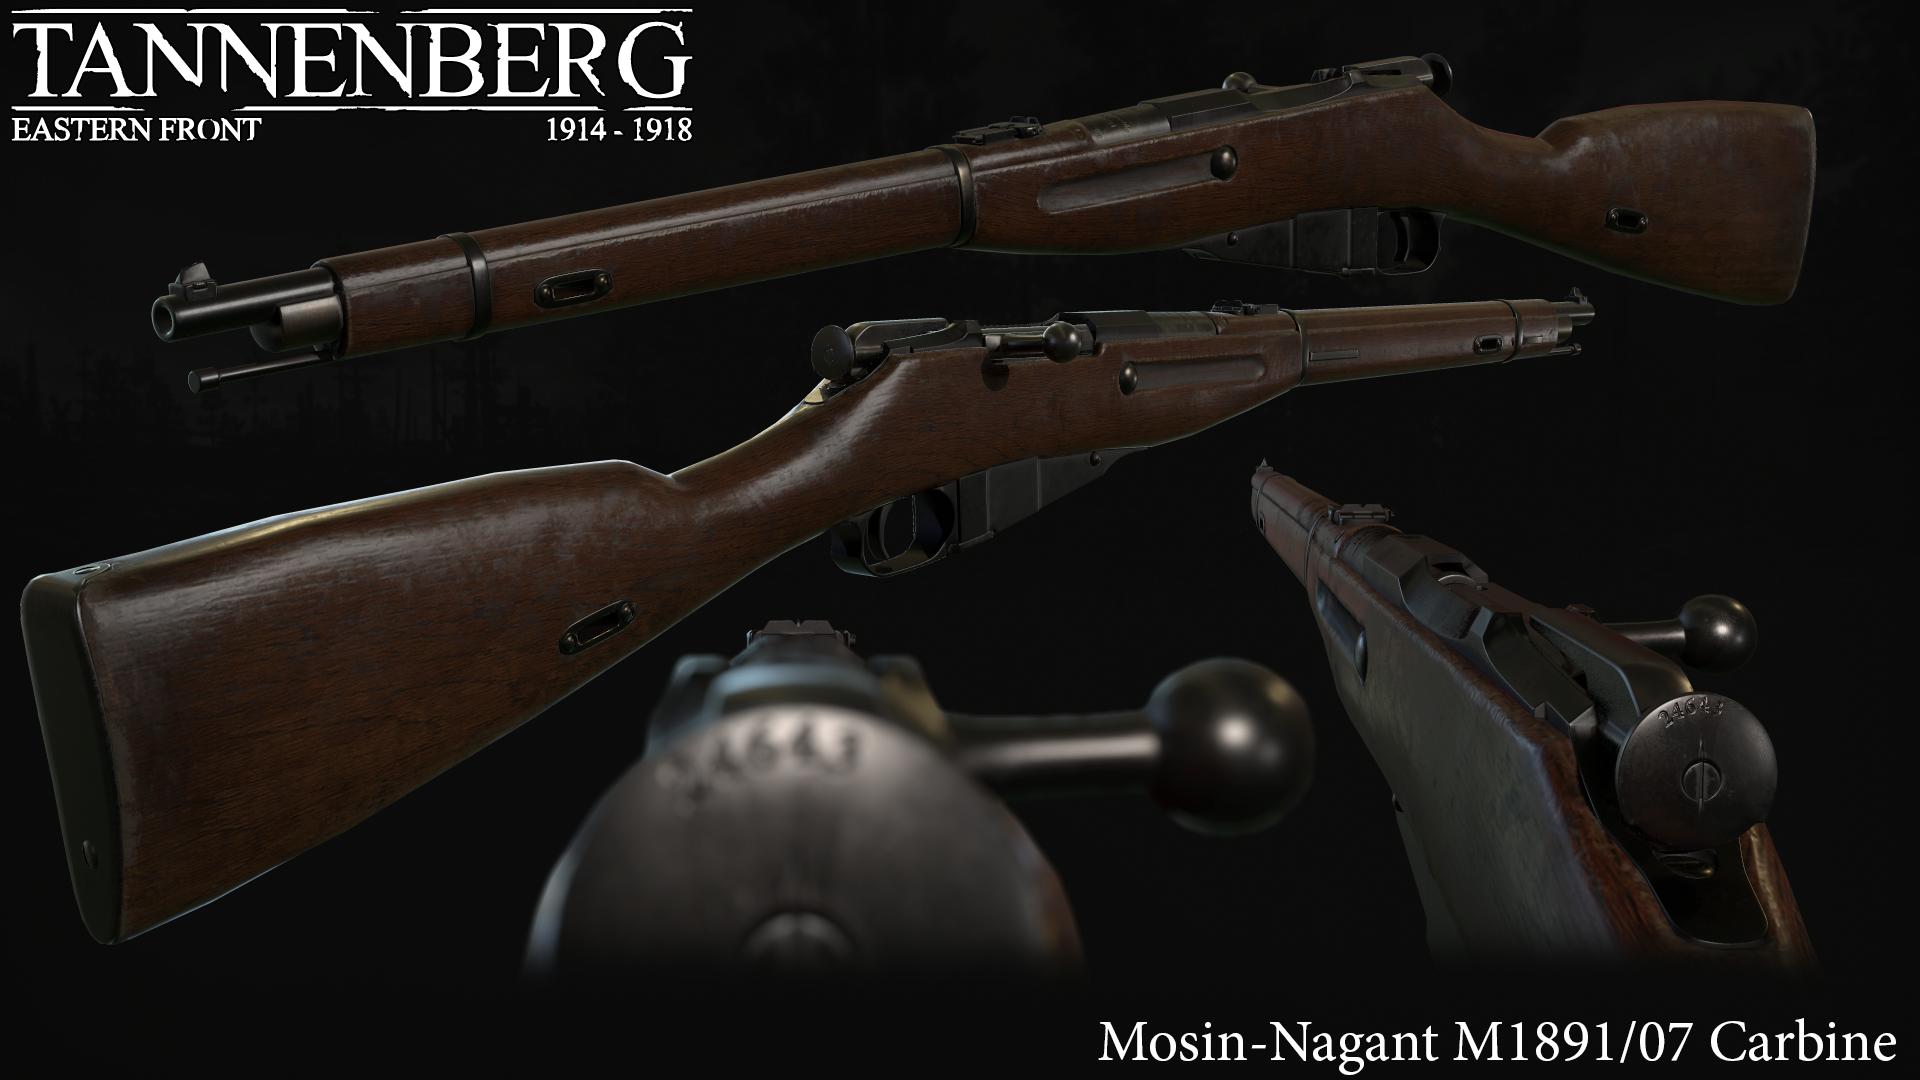 Moison-Nagant M1891/07 Carbine